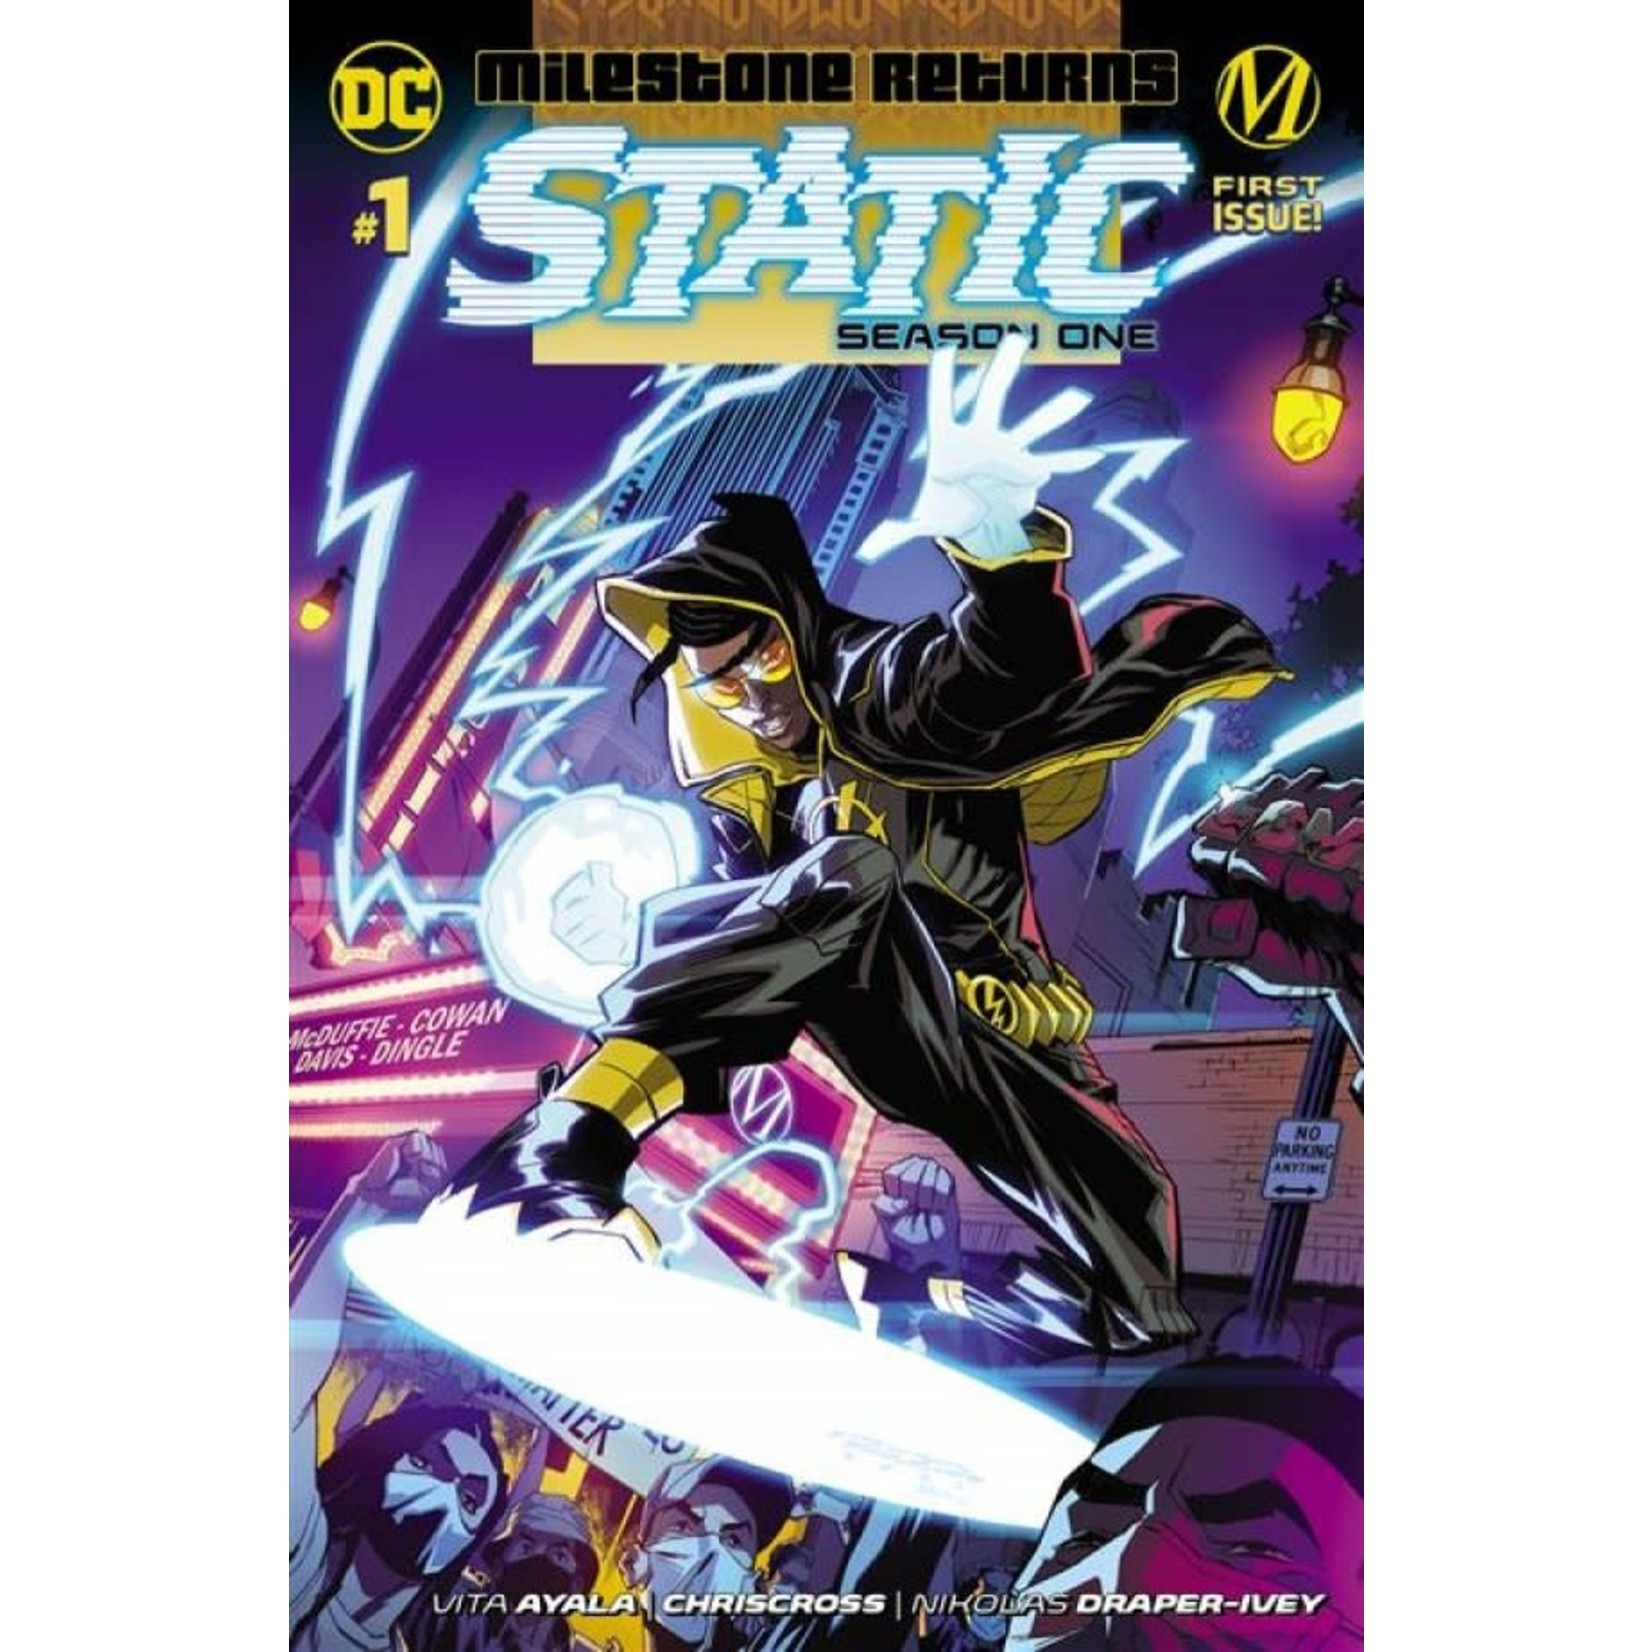 DC Comics STATIC SEASON ONE #1 CVR A KHARY  RANDOLPH